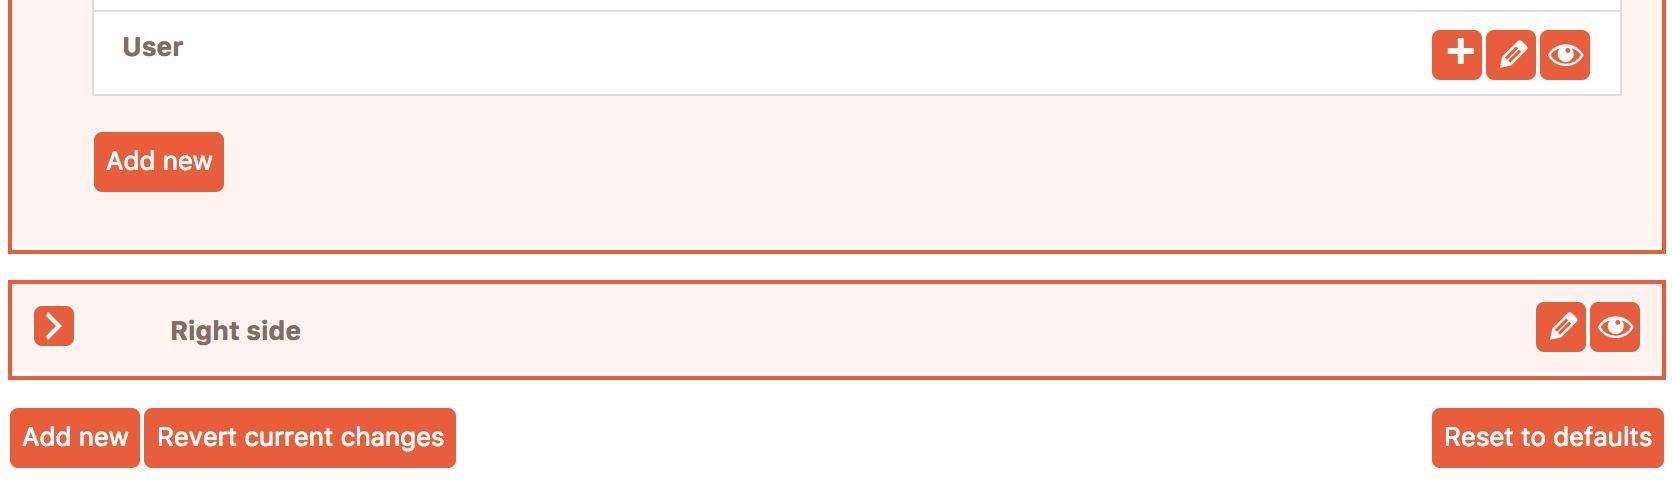 Option for adding new admin bar items in Cusmin Admin Bar Editor